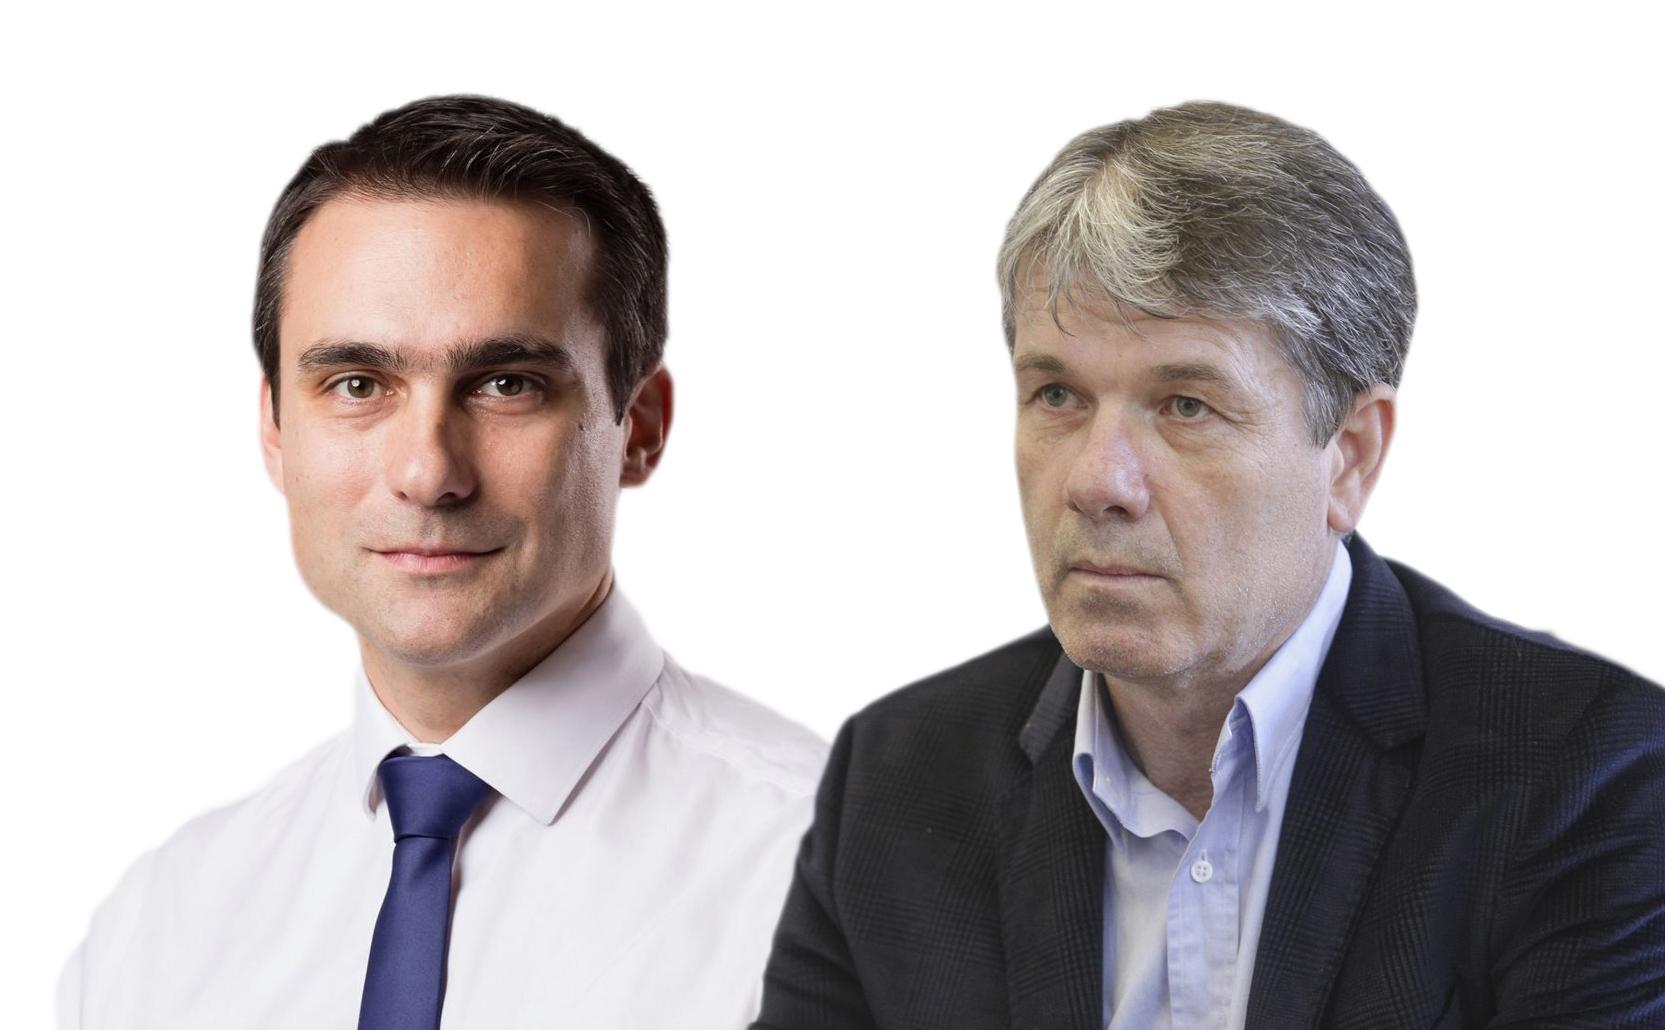 Promisiuni electorale – Brașov